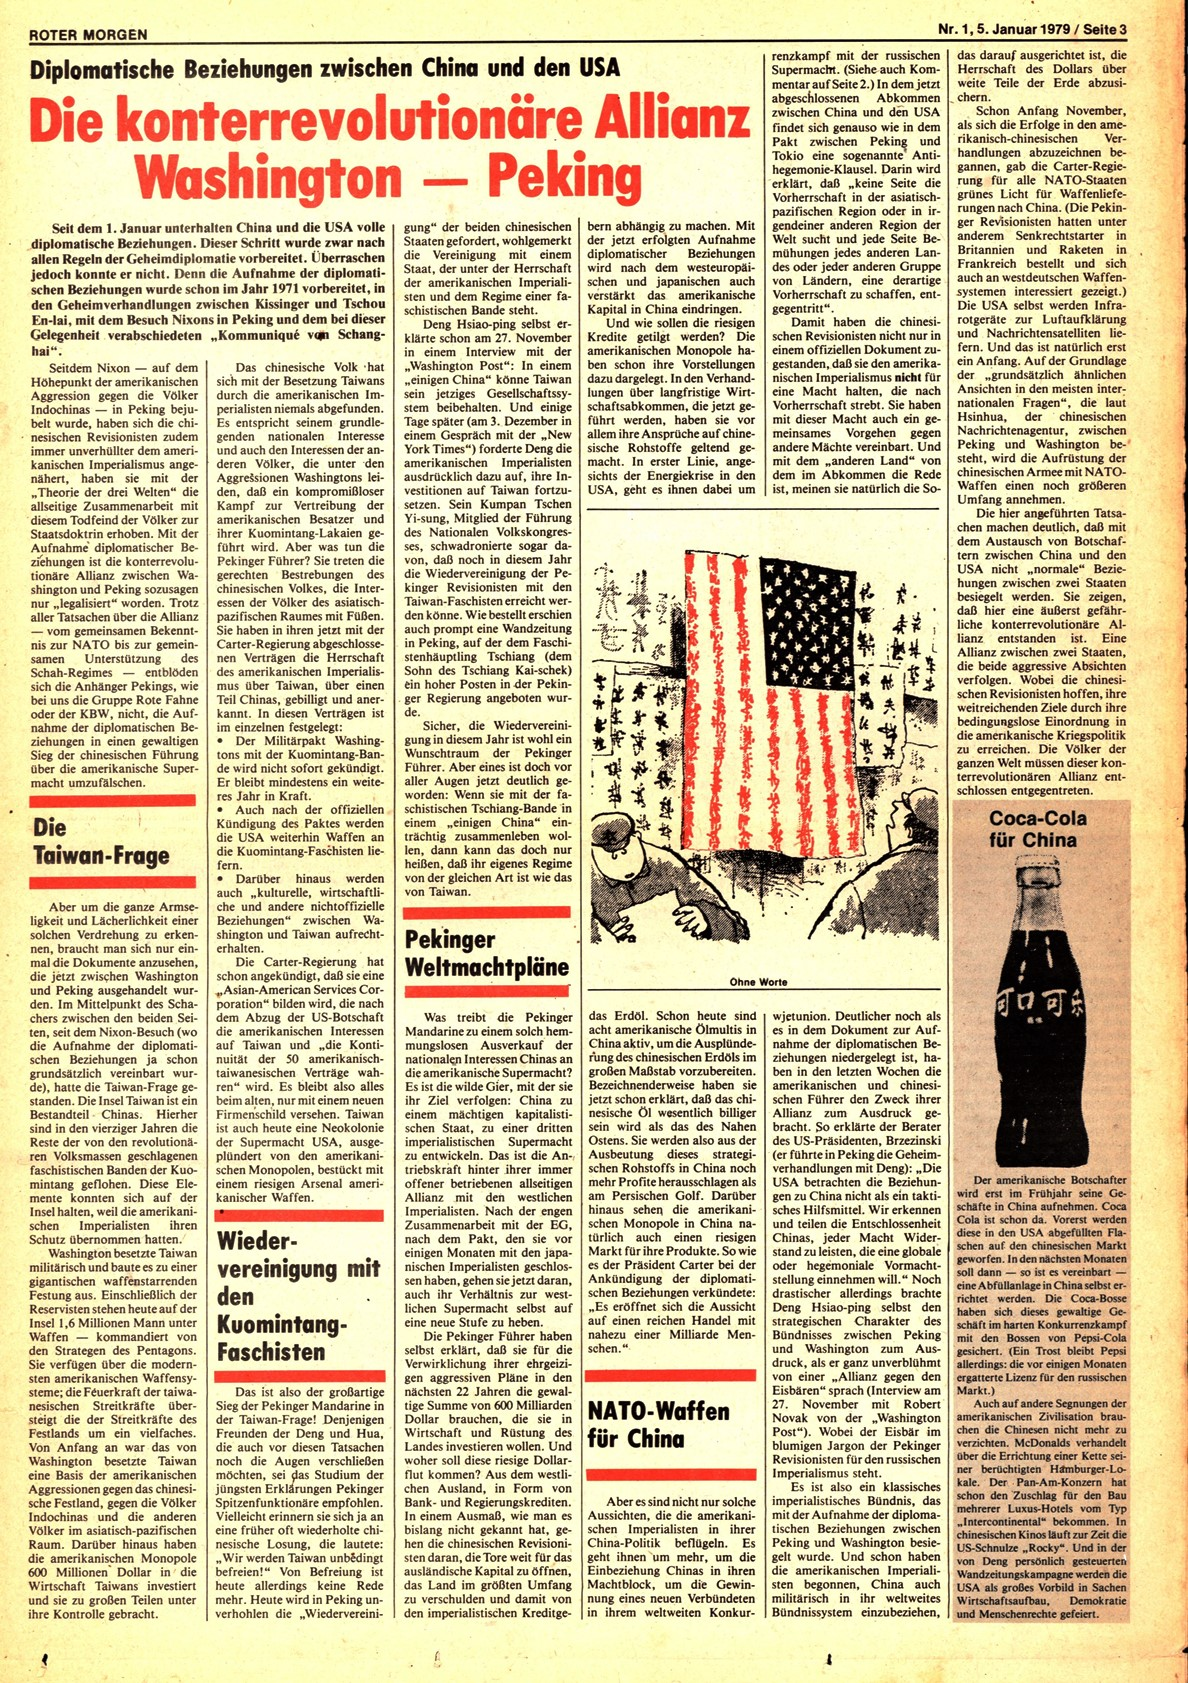 Roter Morgen, 13. Jg., 5. Januar 1979, Nr. 1, Seite 3